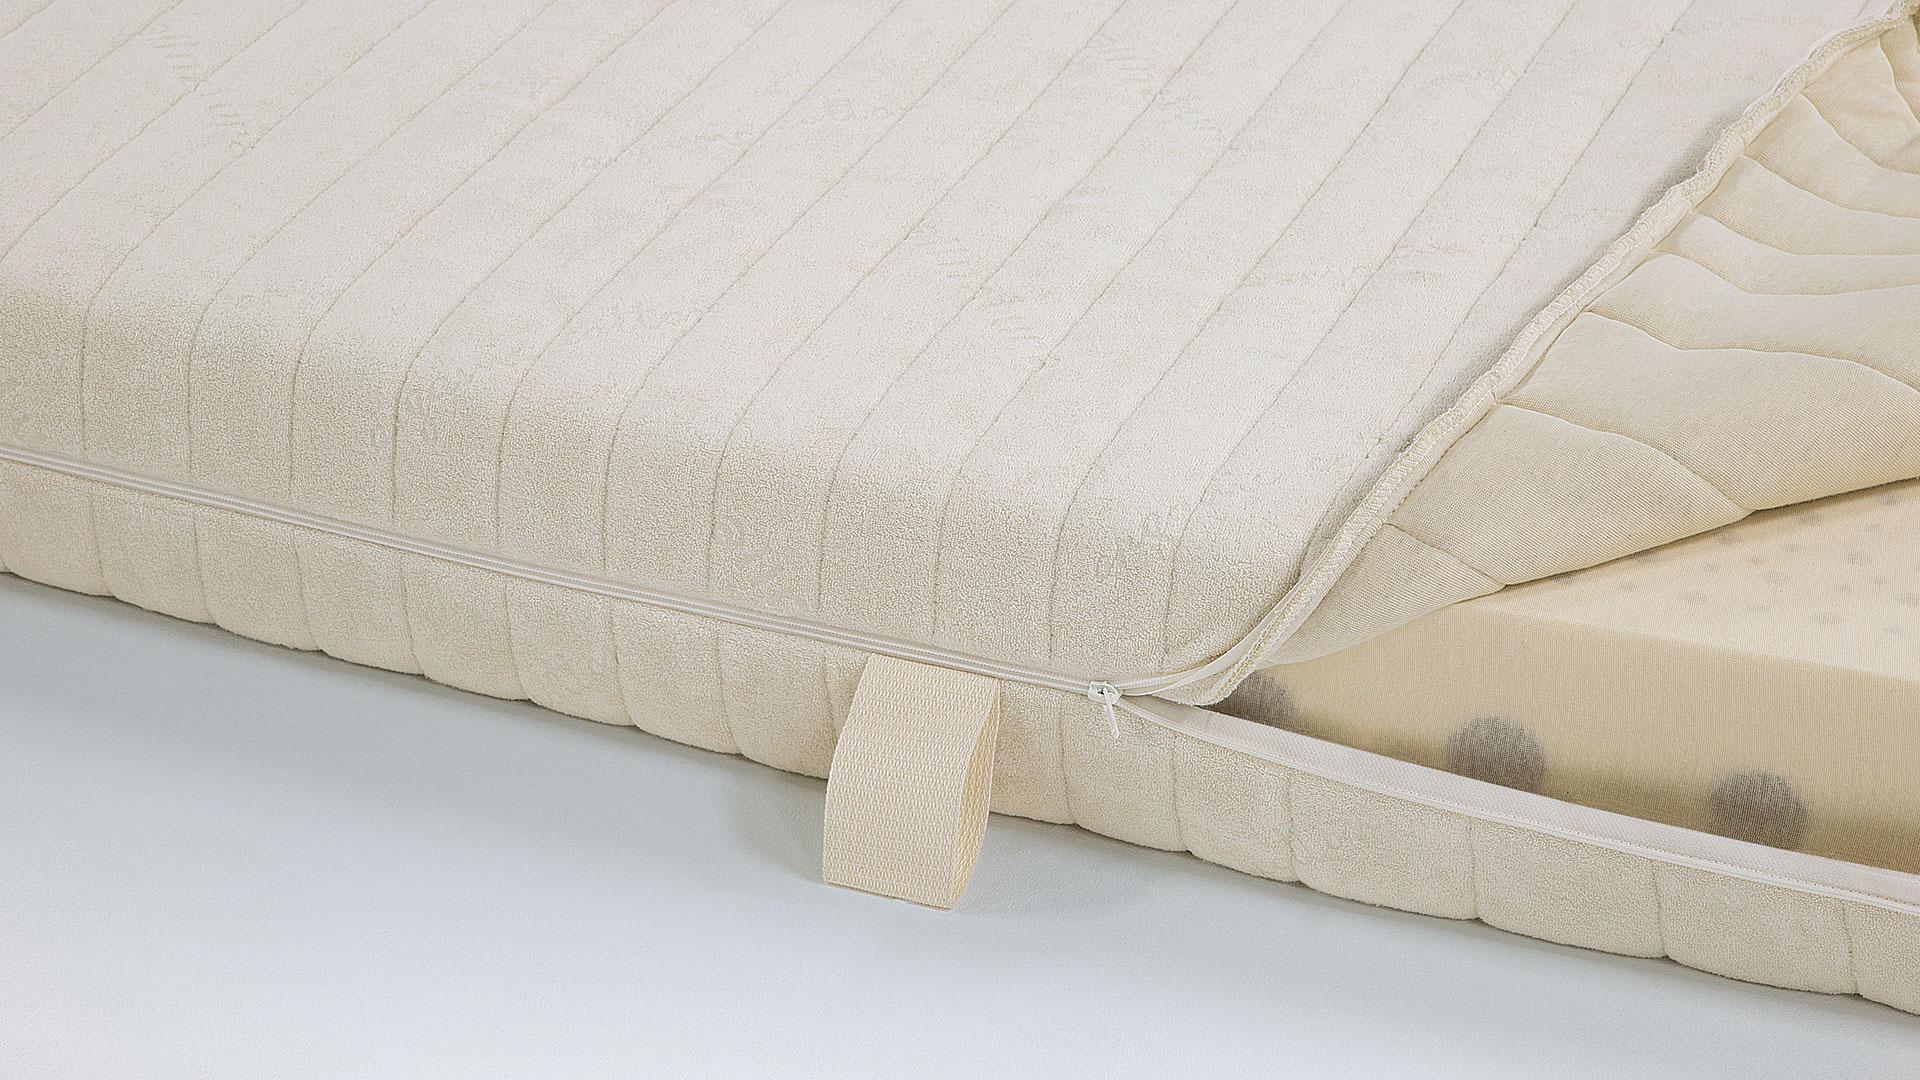 Vorschau Naturlatex Matratze Supra Comfort Unterbezug Aus Baumwoll Feinjersey Trikot